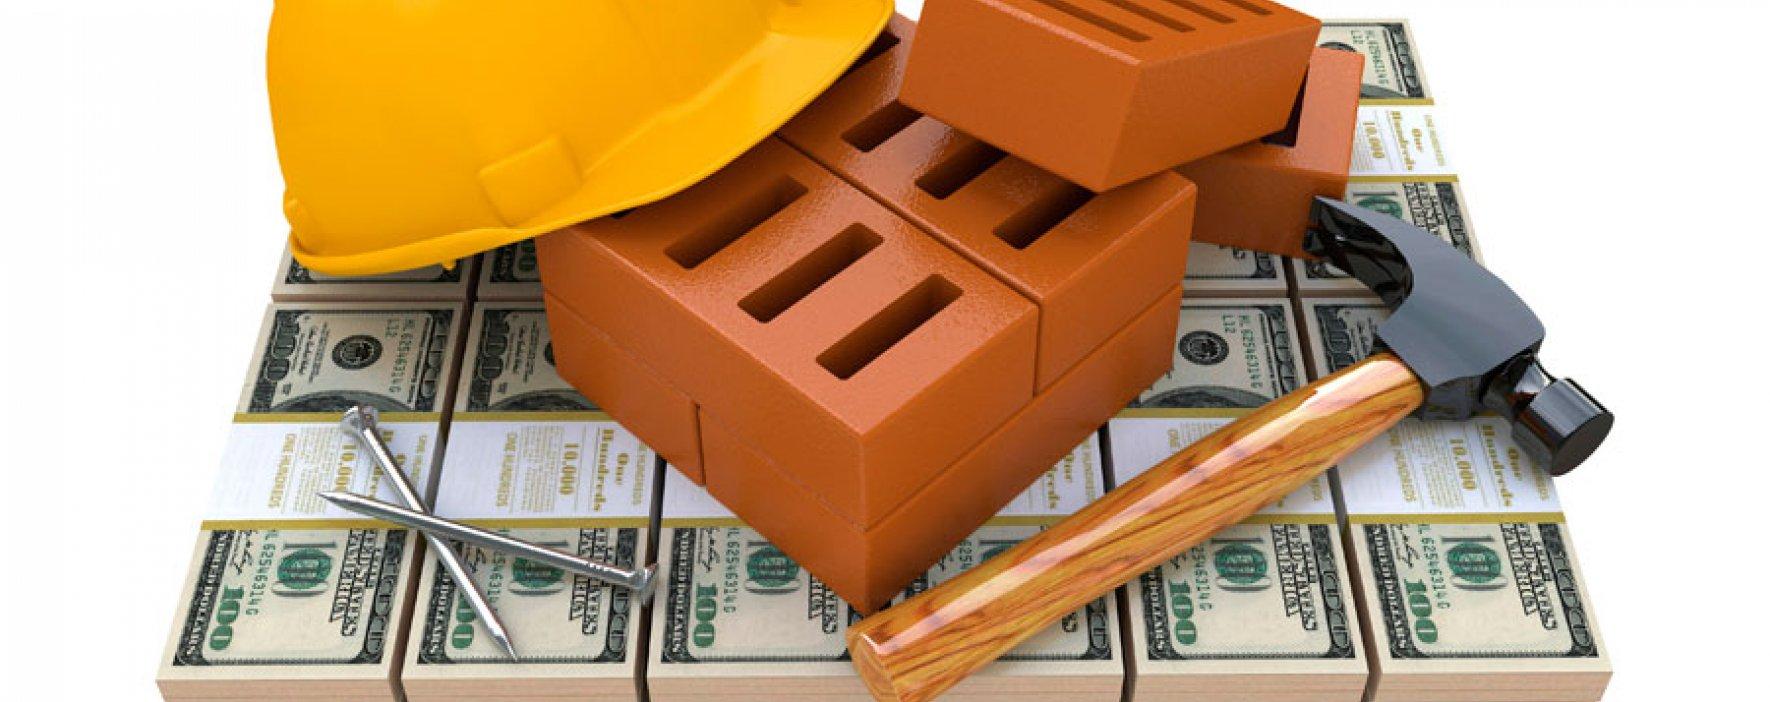 Construcción aportará cerca de 13 billones de pesos a economía antioqueña